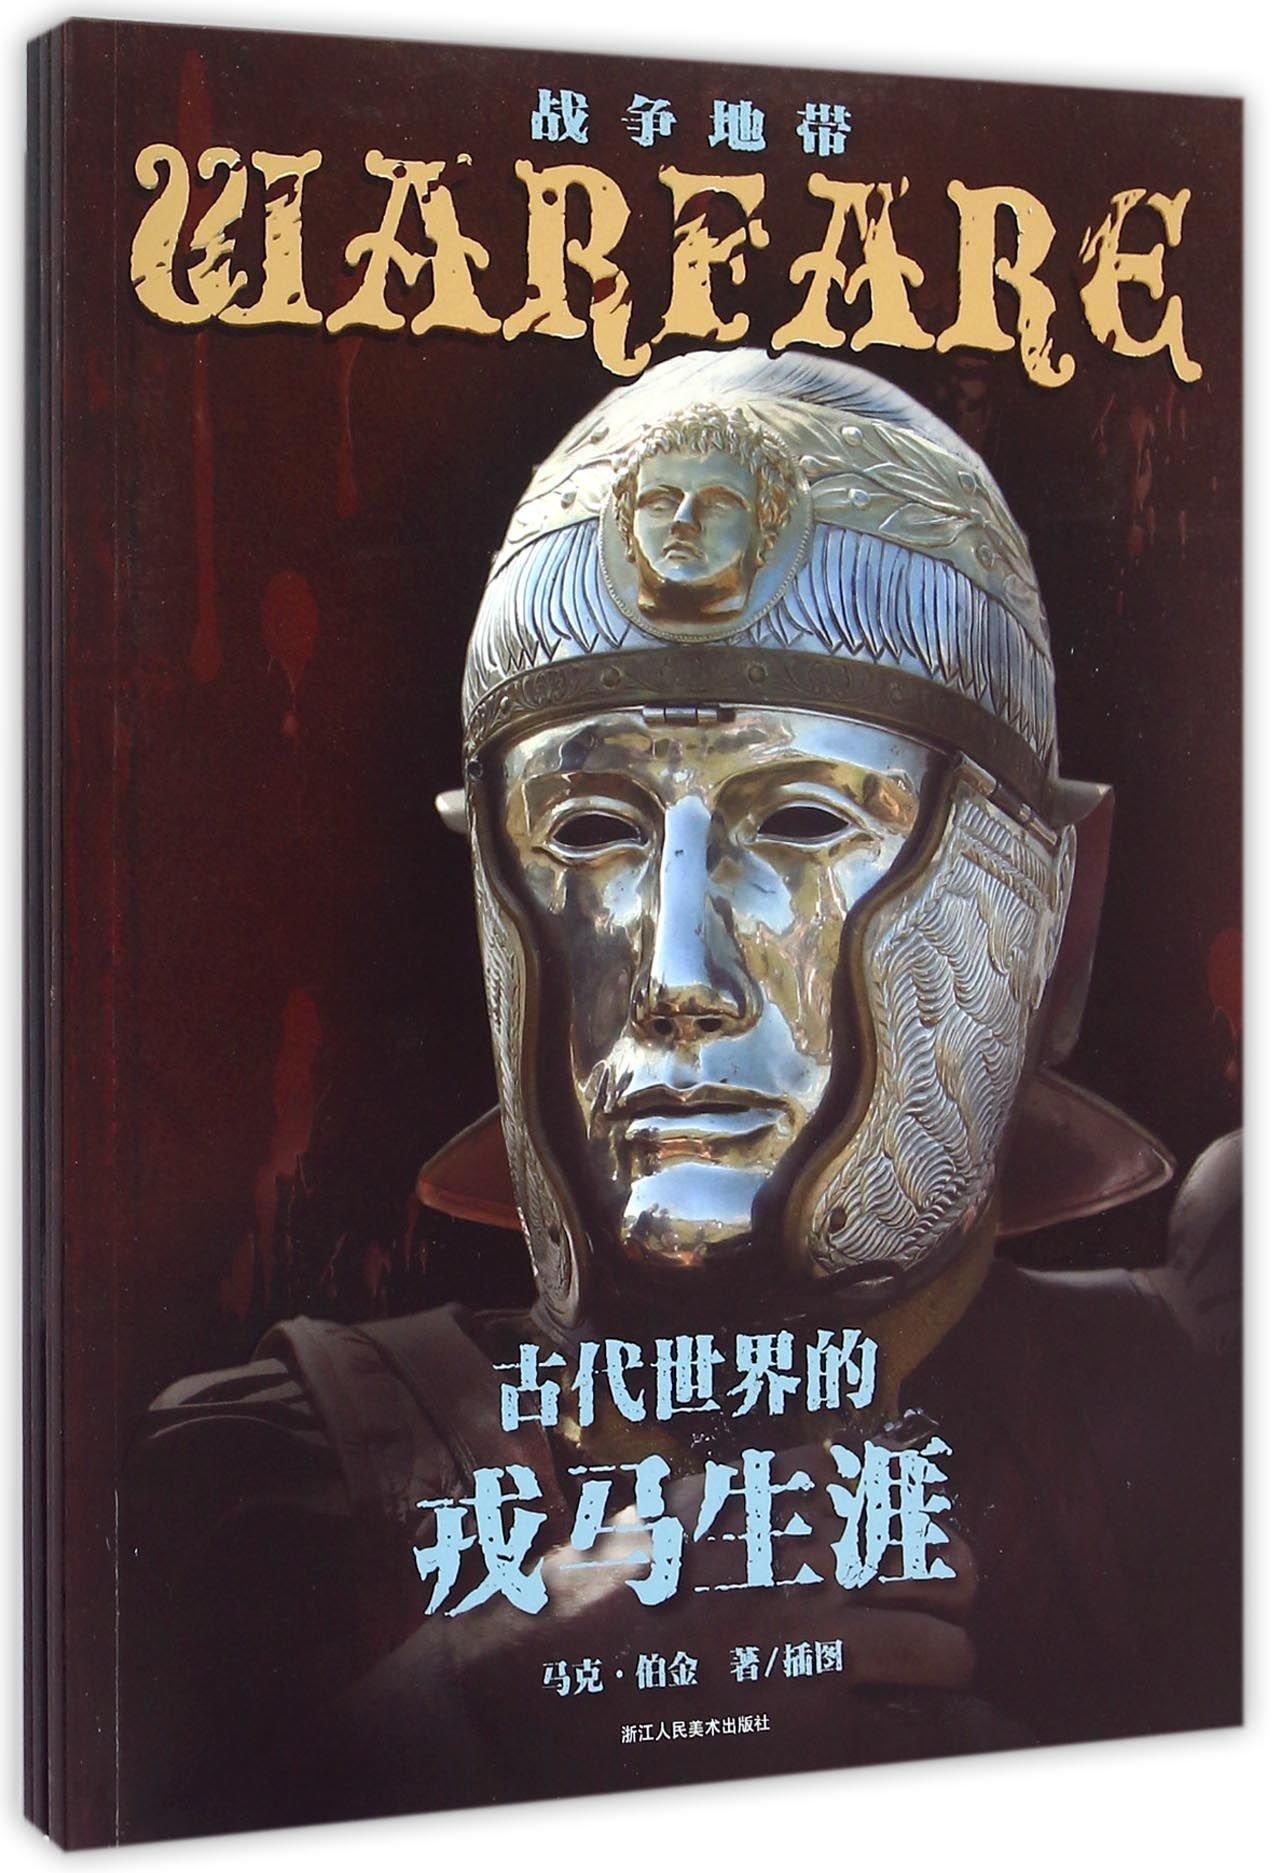 Read Online Warfare (Chinese Edition) PDF